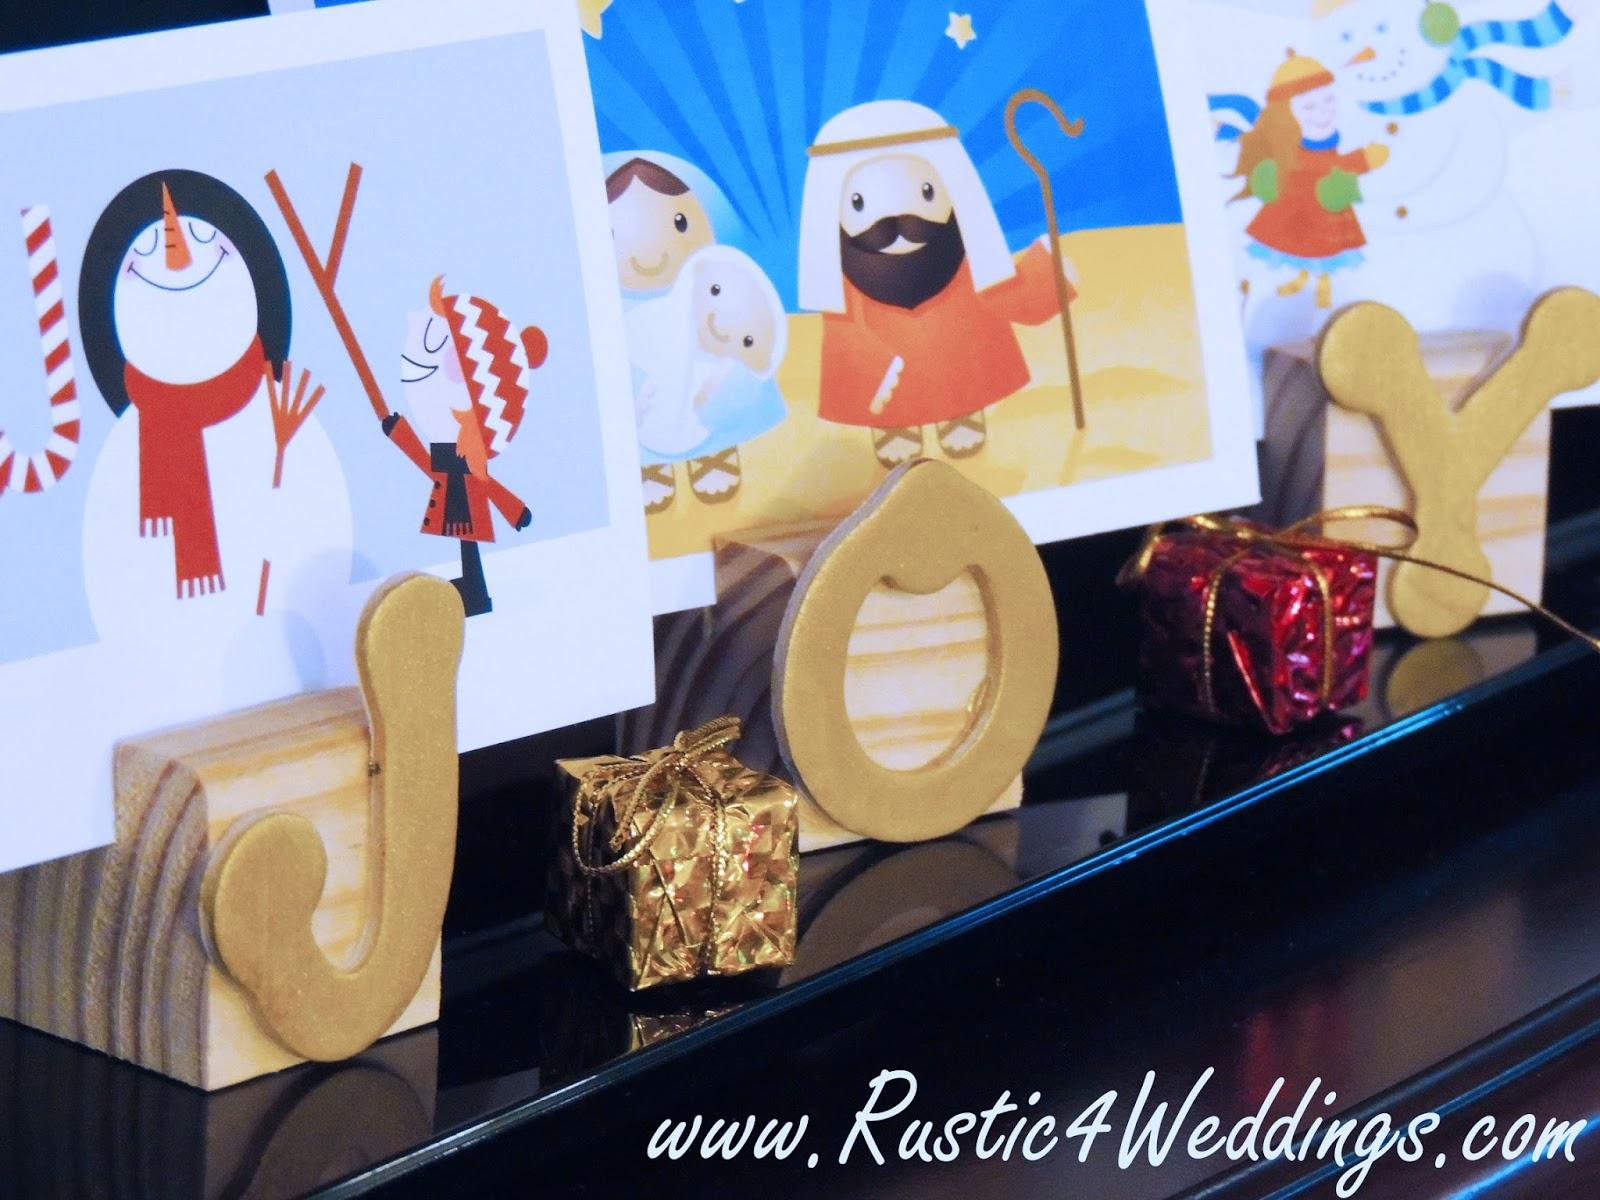 Rustic 4 weddings diy wooden christmas card holder idea diy christmas card holder idea solutioingenieria Choice Image